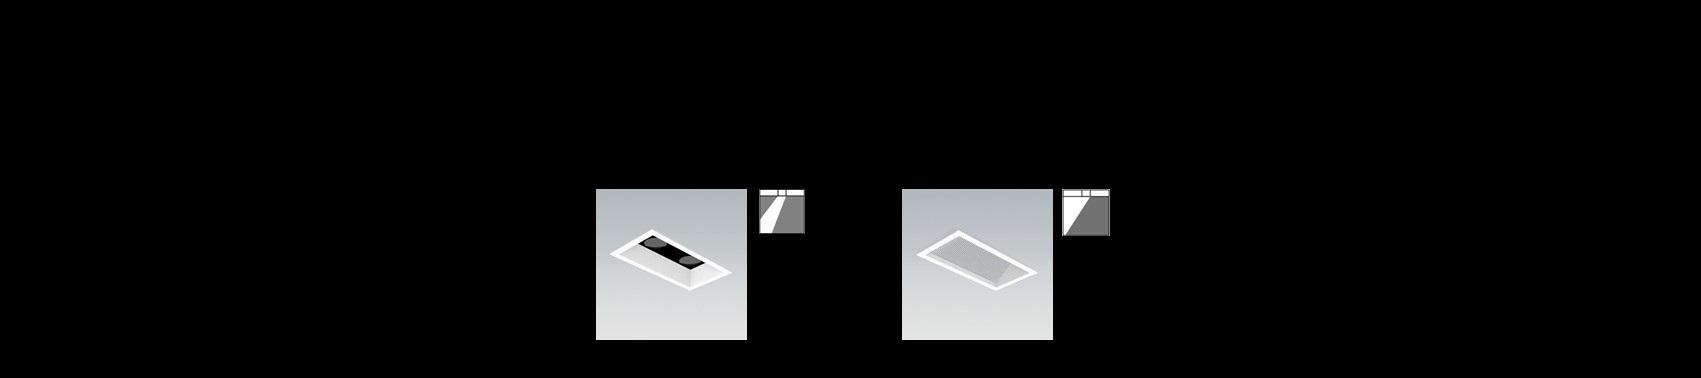 19b.afb-header-lucent-lighting-plus-multi-trim-zwart-website